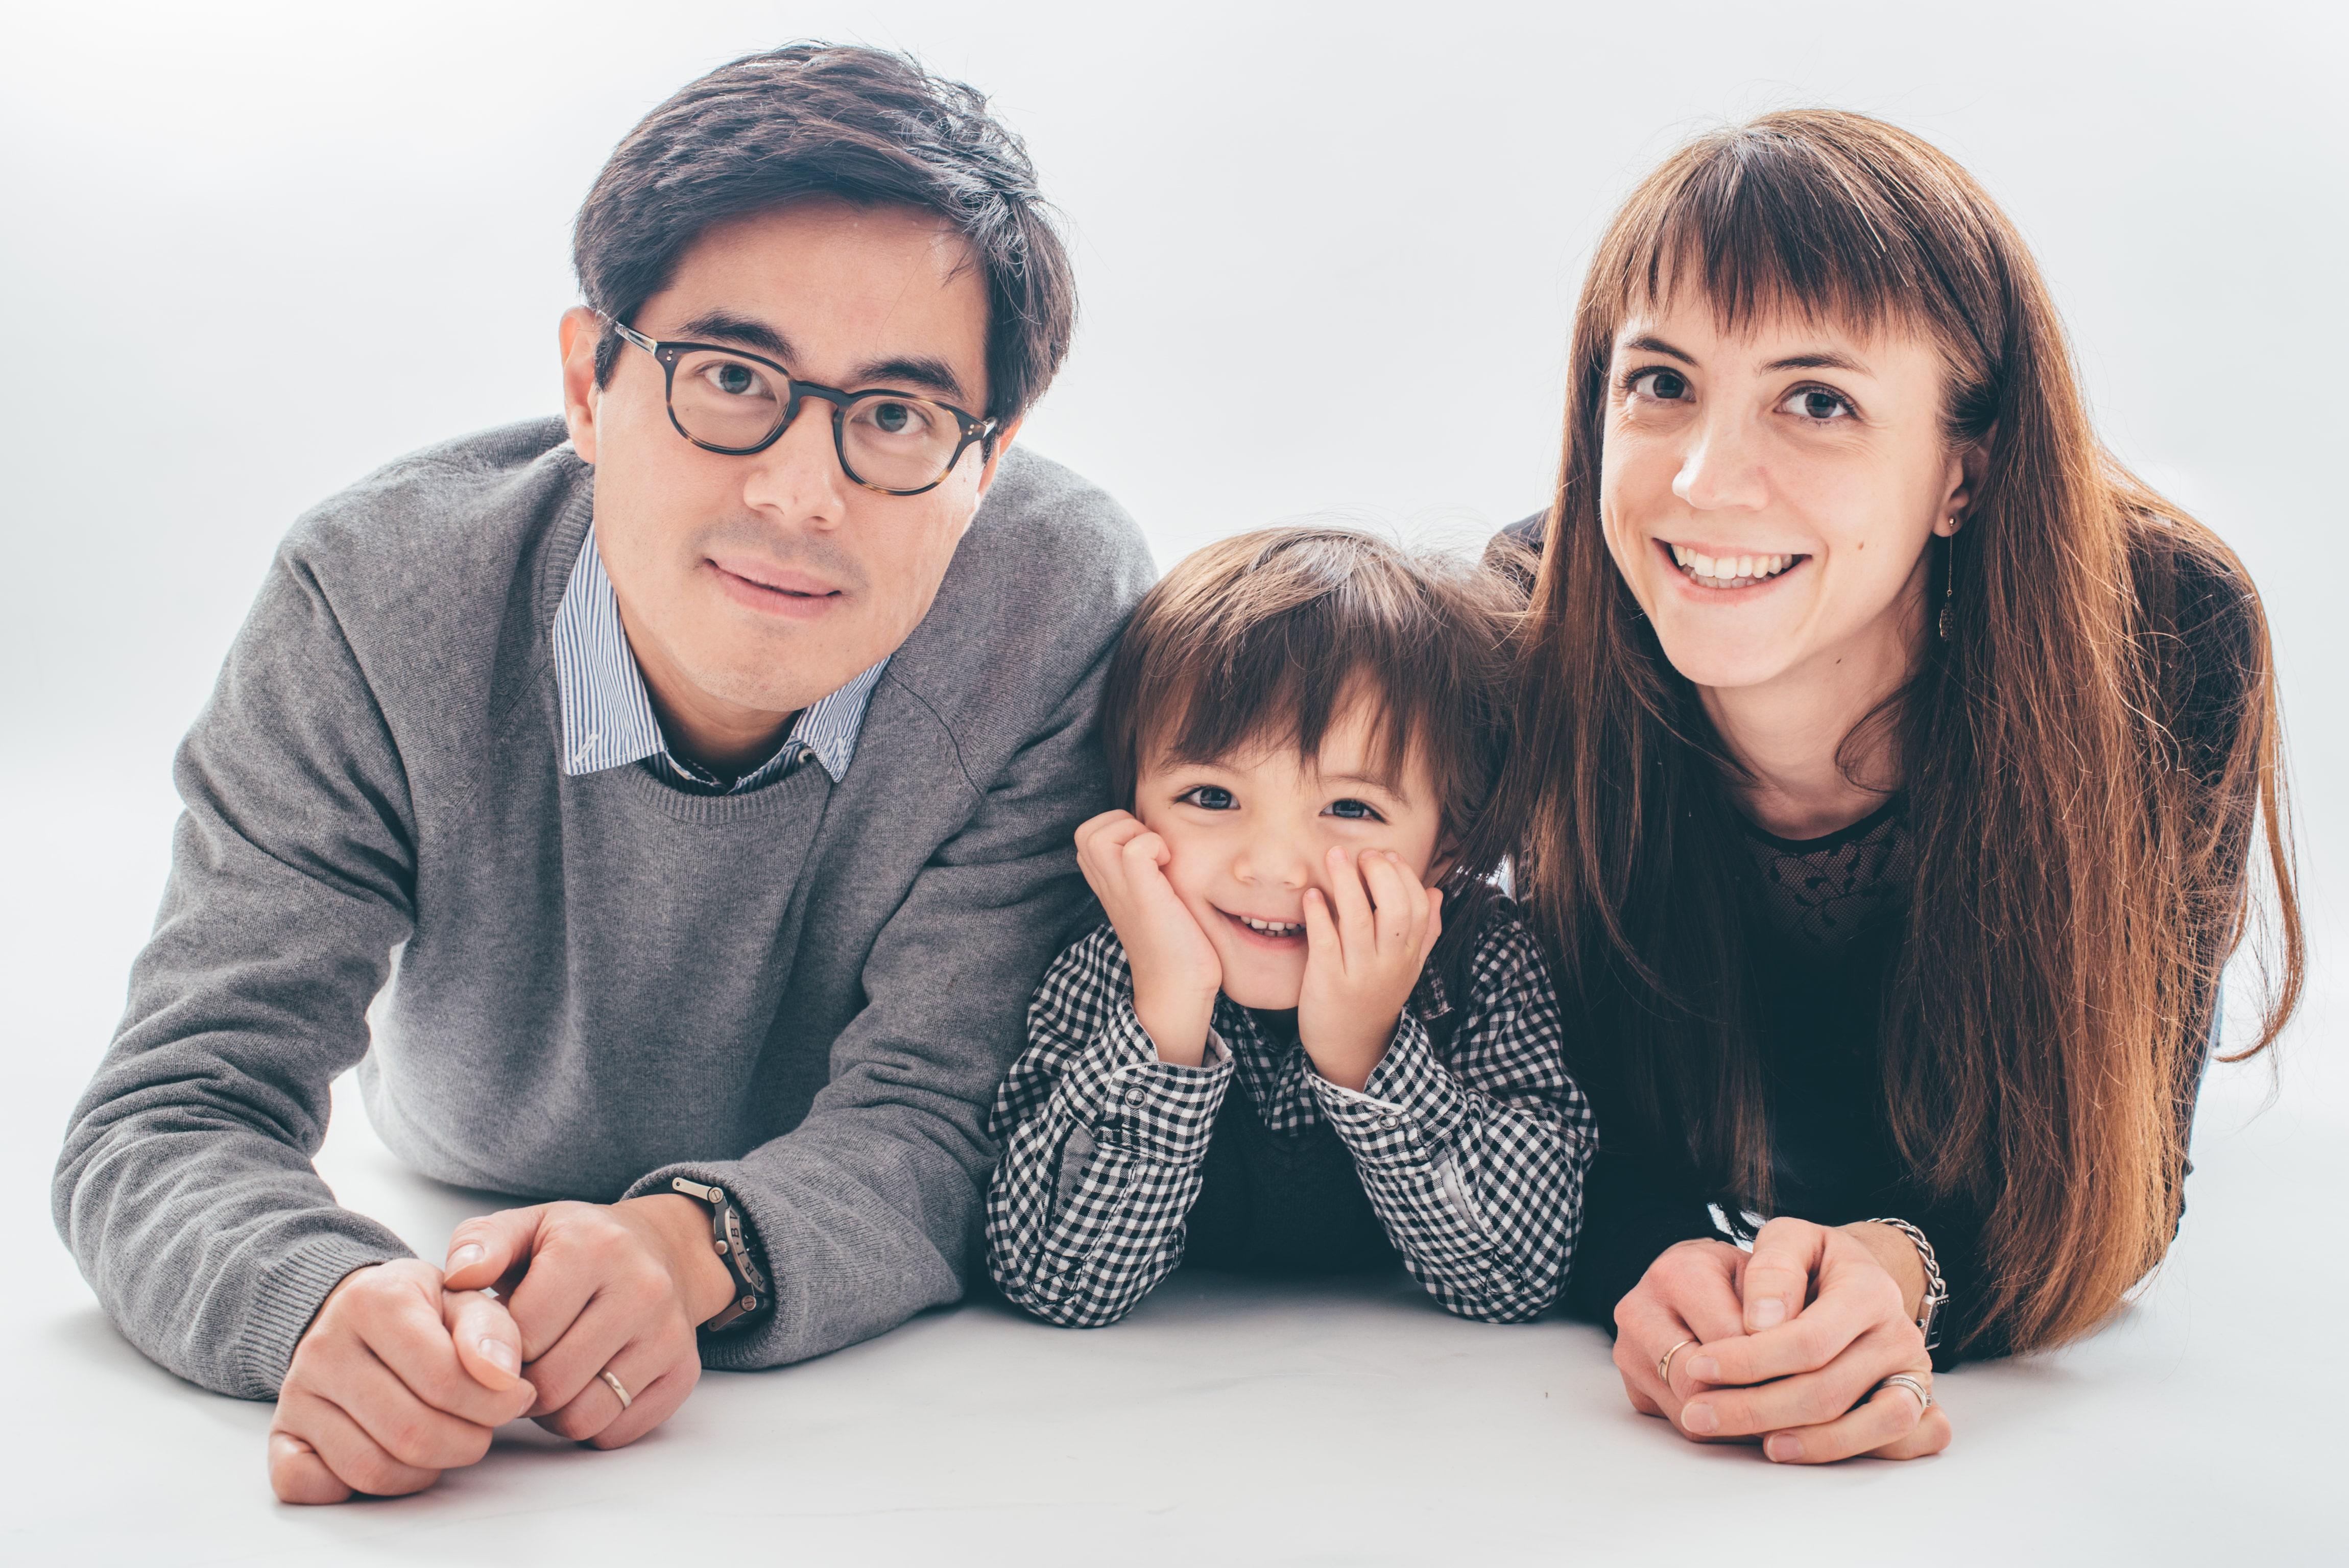 seance-photo-famille-studio-photo-paris-